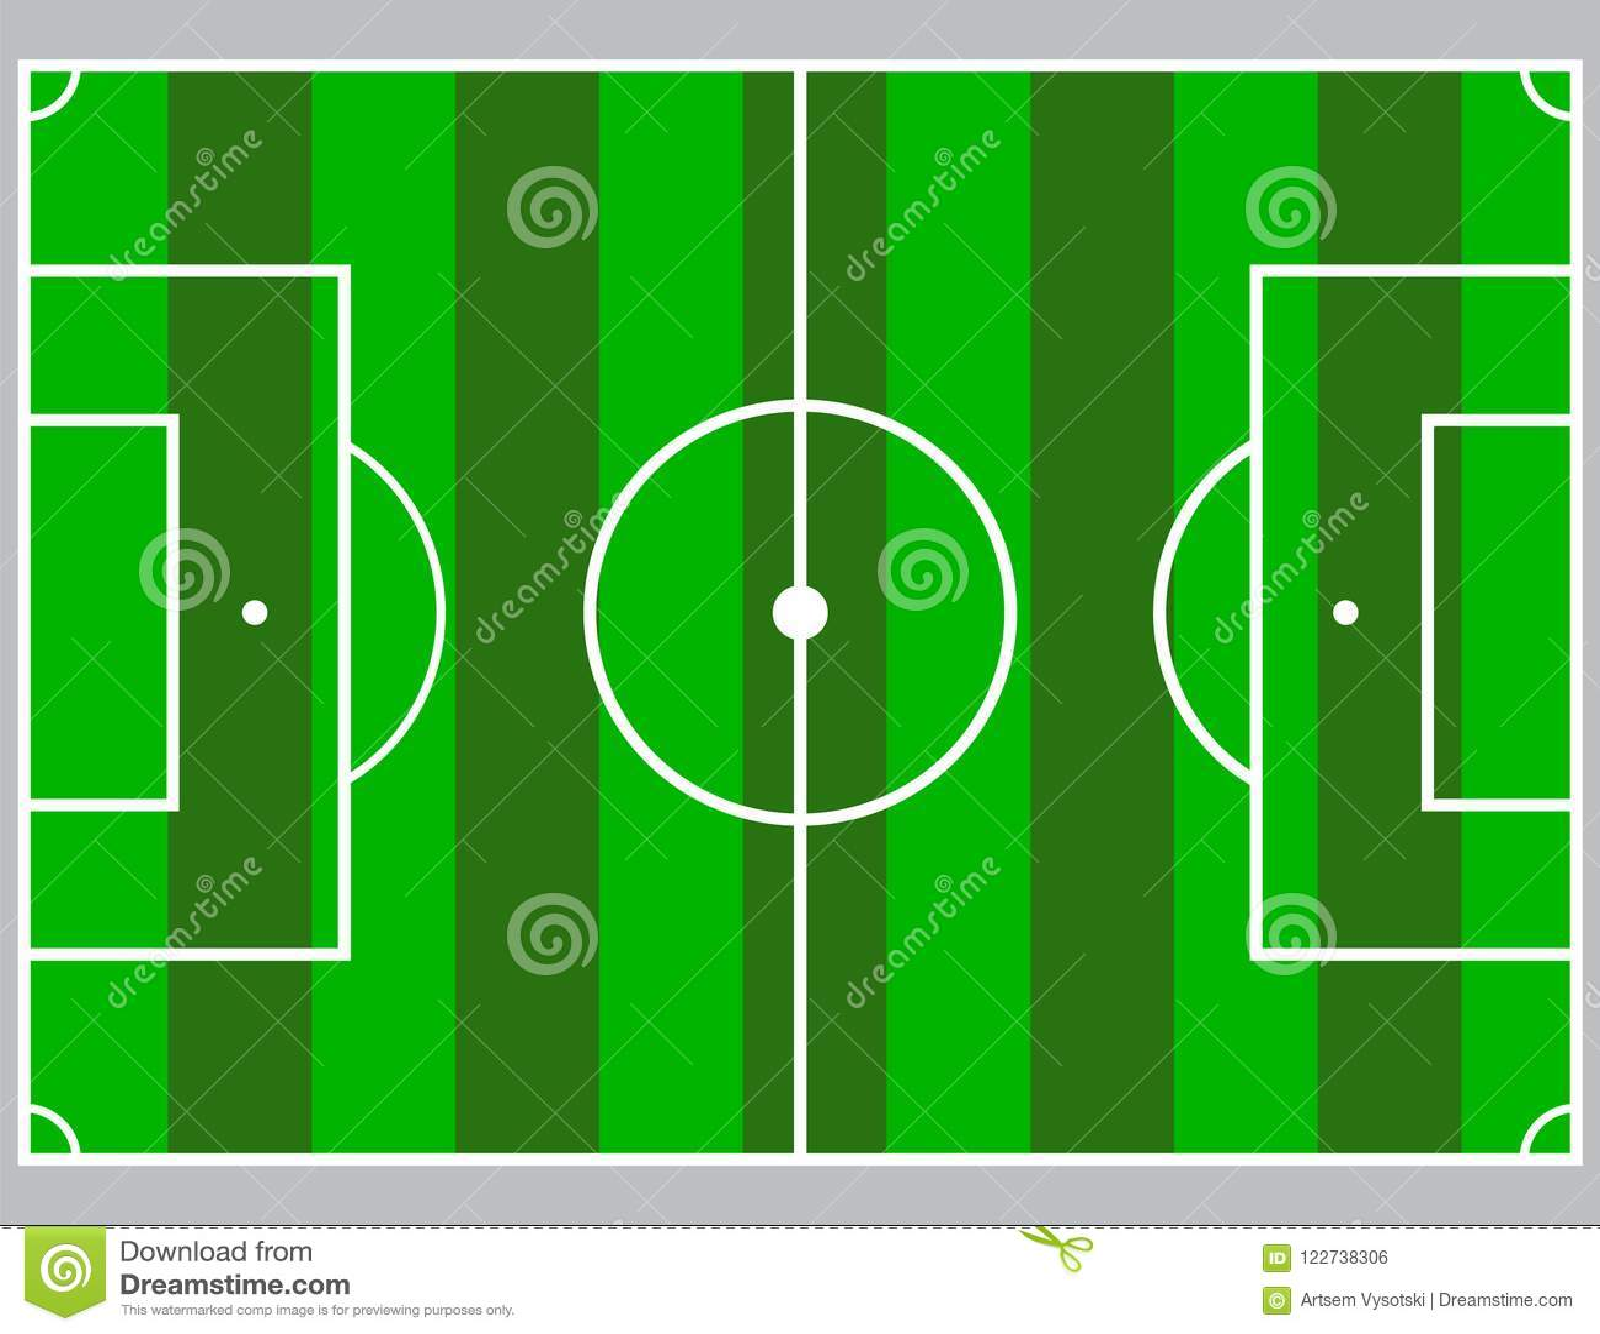 flat green field football grass soccer field with line template